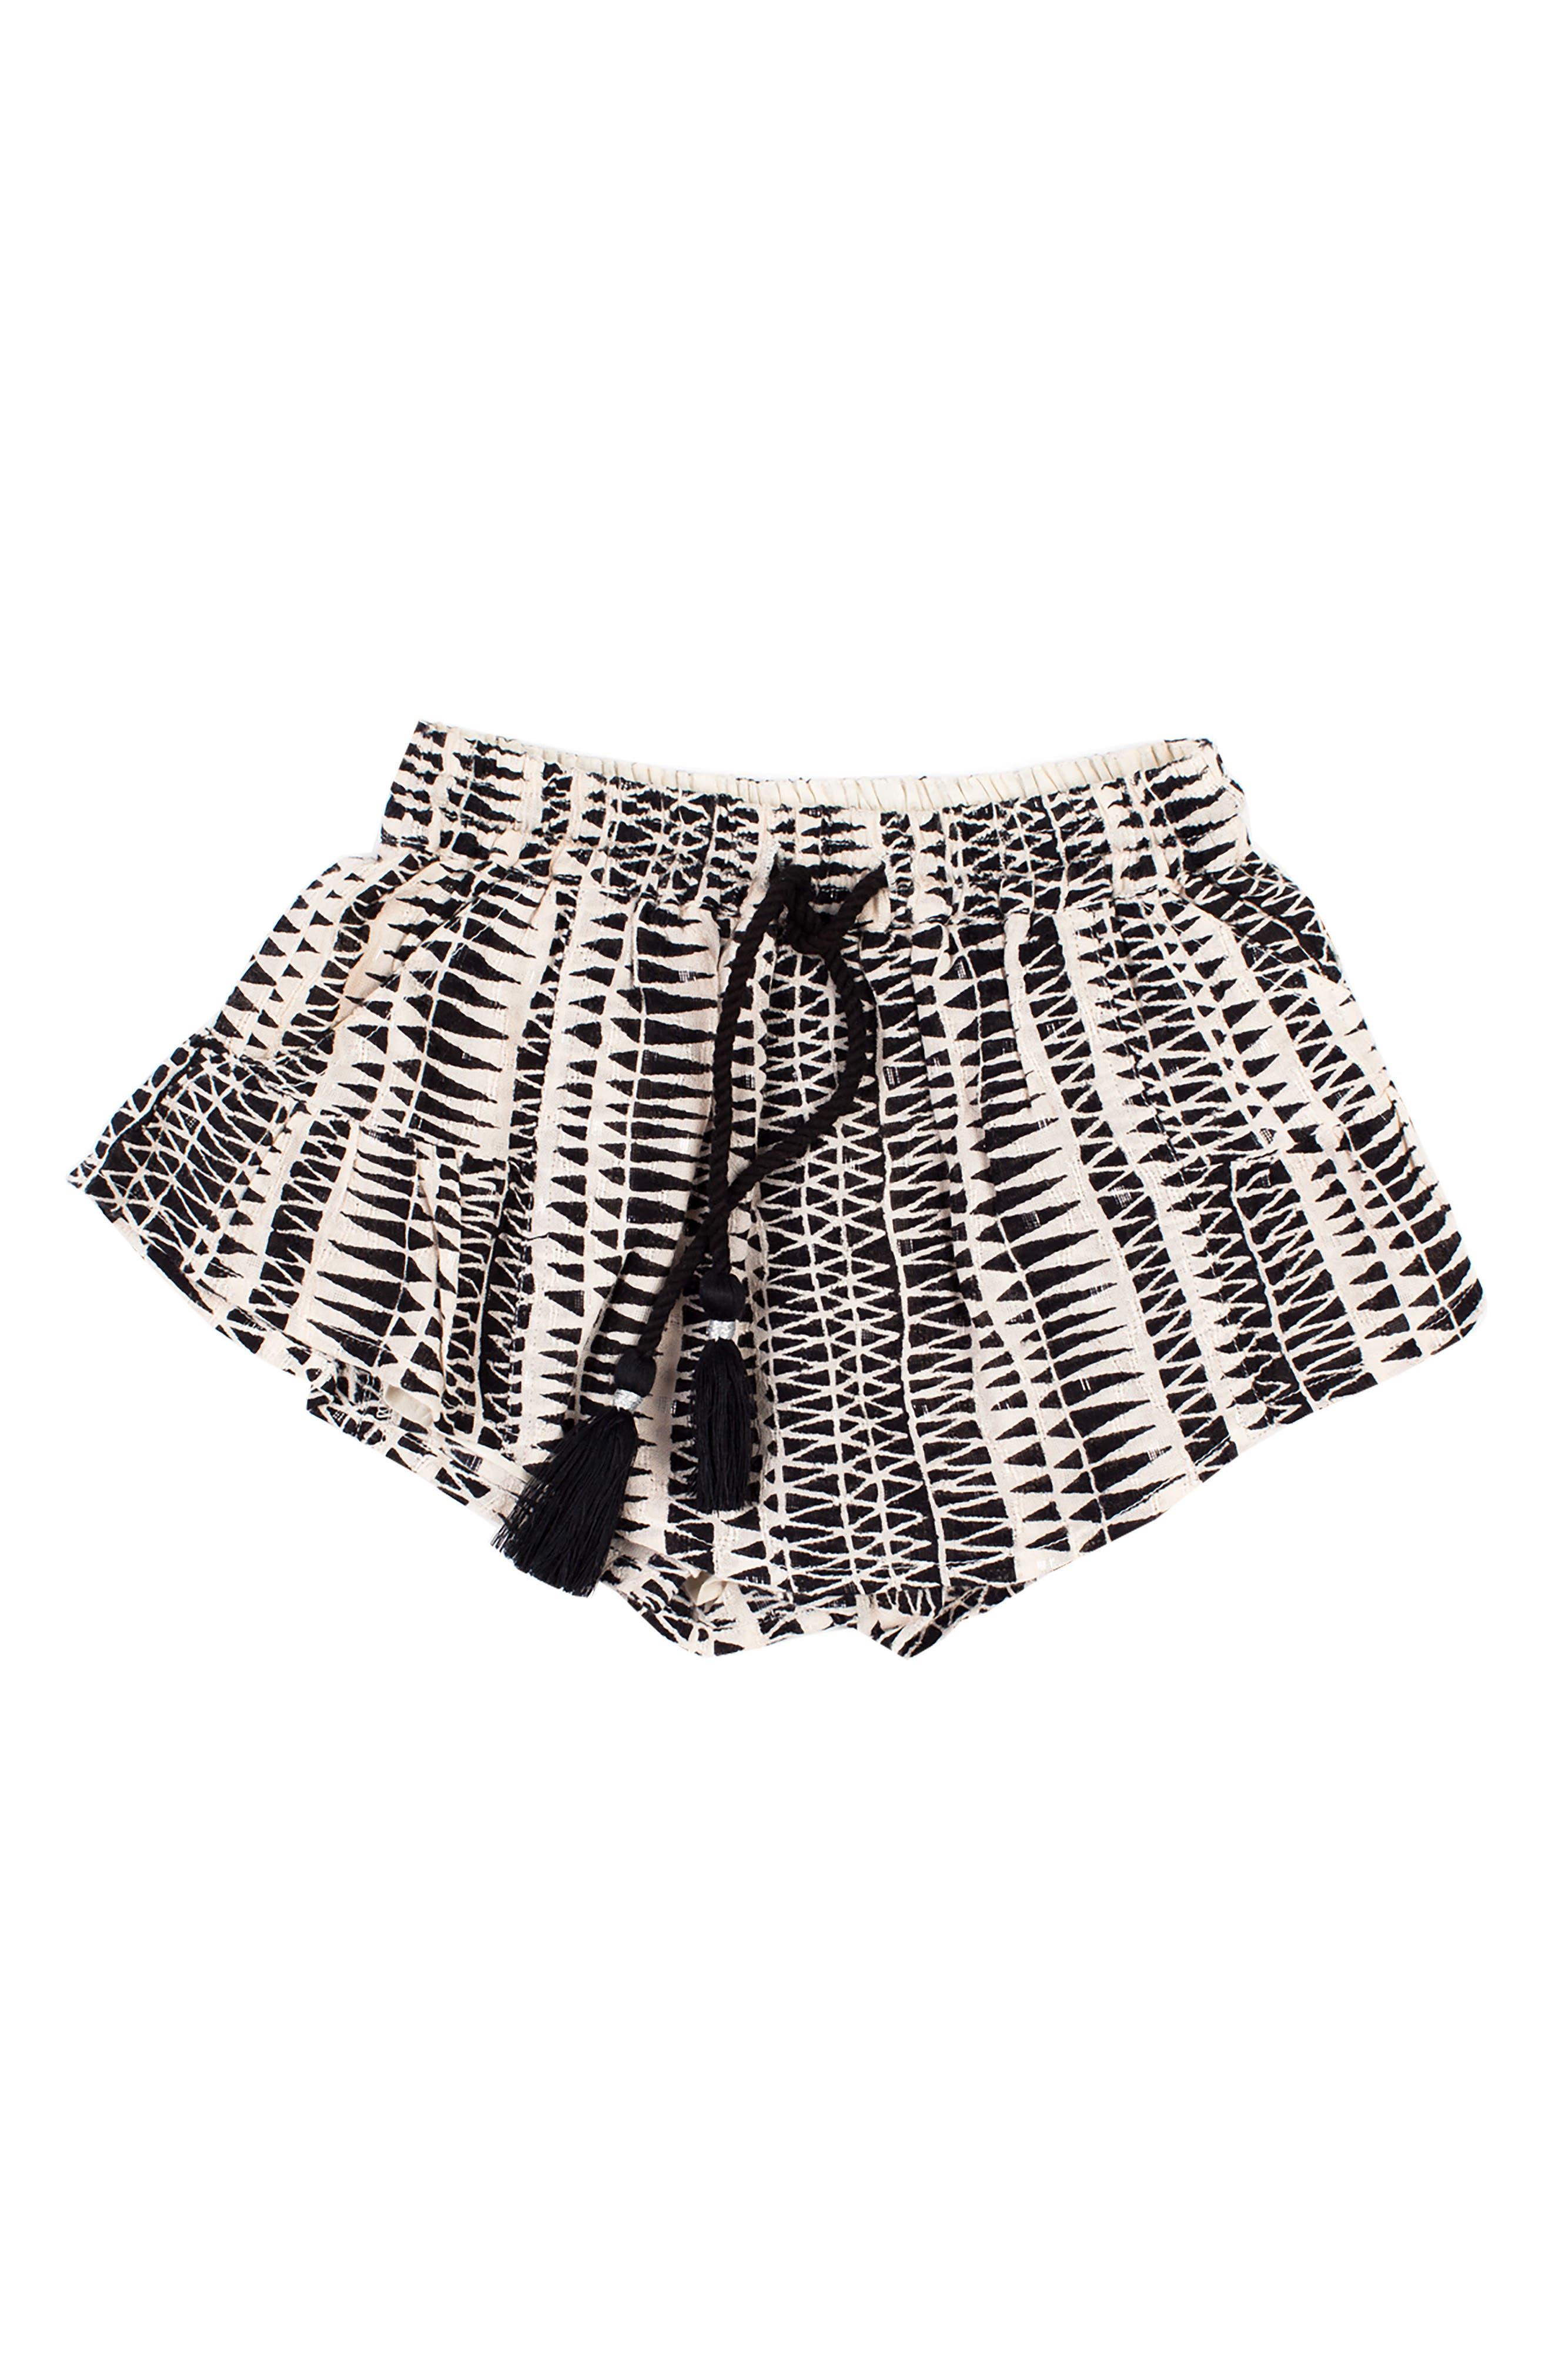 Little Dipper Print Shorts,                             Main thumbnail 1, color,                             BLACK